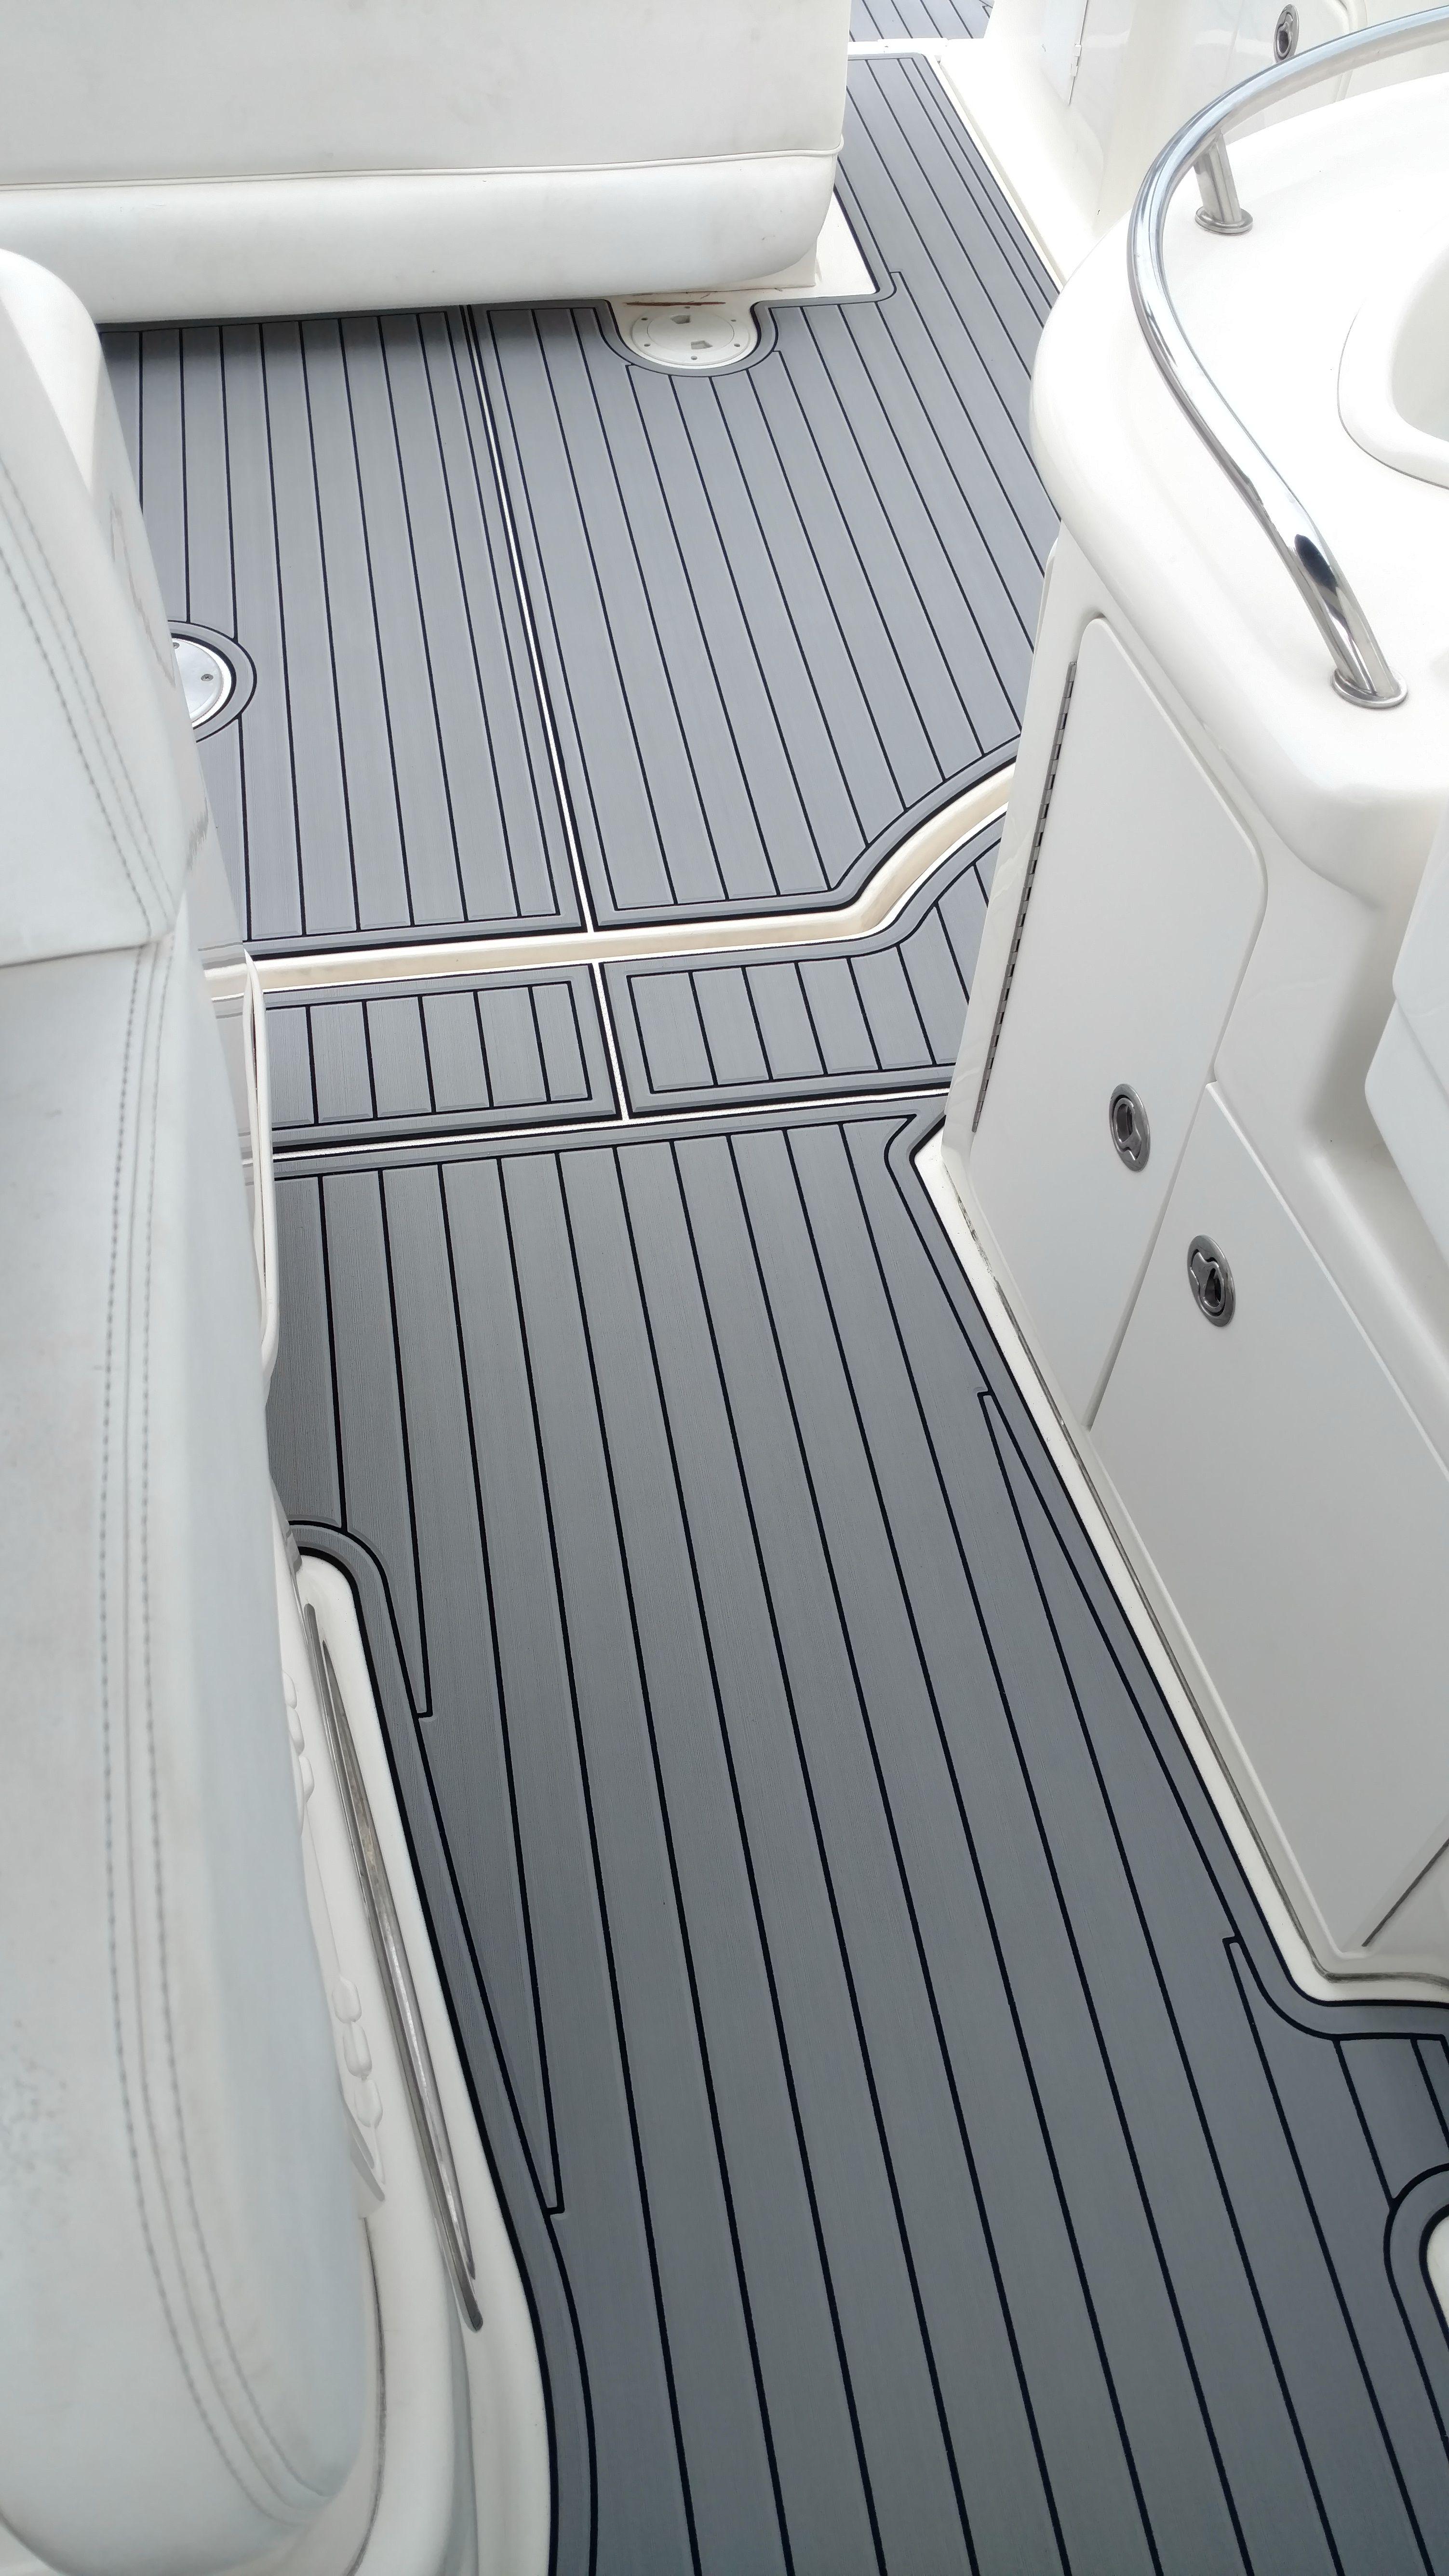 Square 15 x 15 SeaDek Boat Flooring Non Slip Deck Pad Self Adhesive